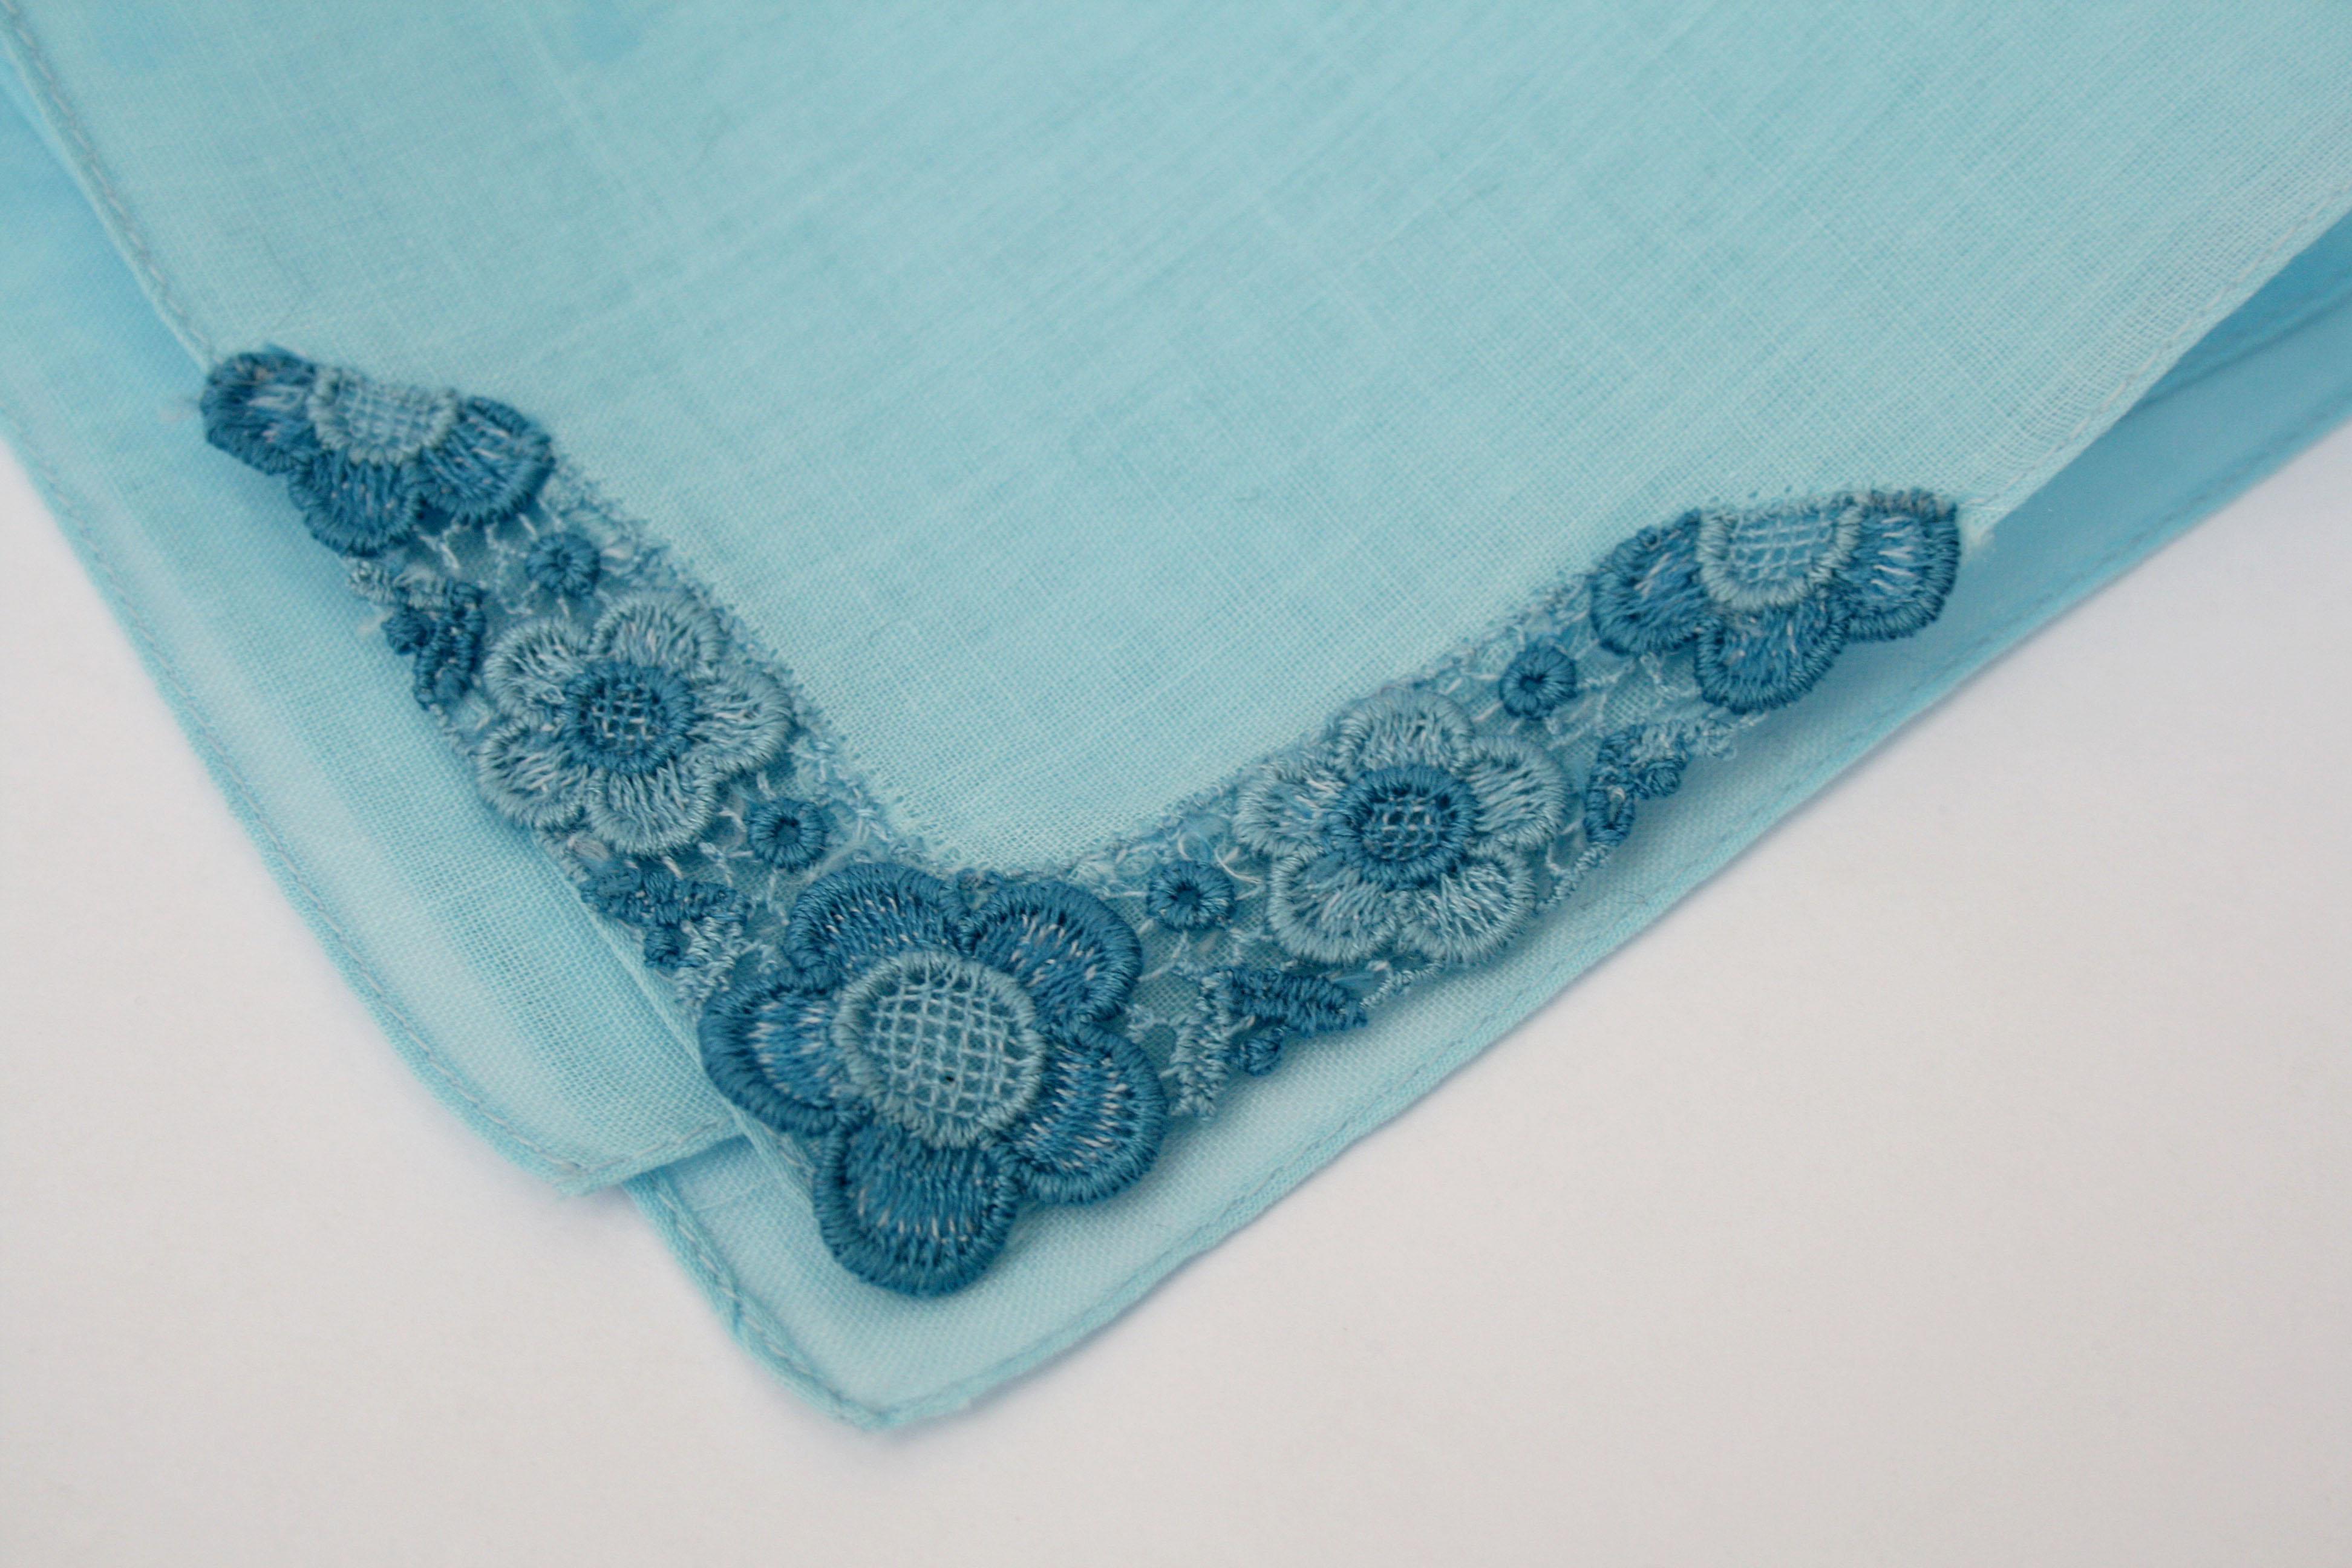 Vintage blauw zakdoekje Something blue